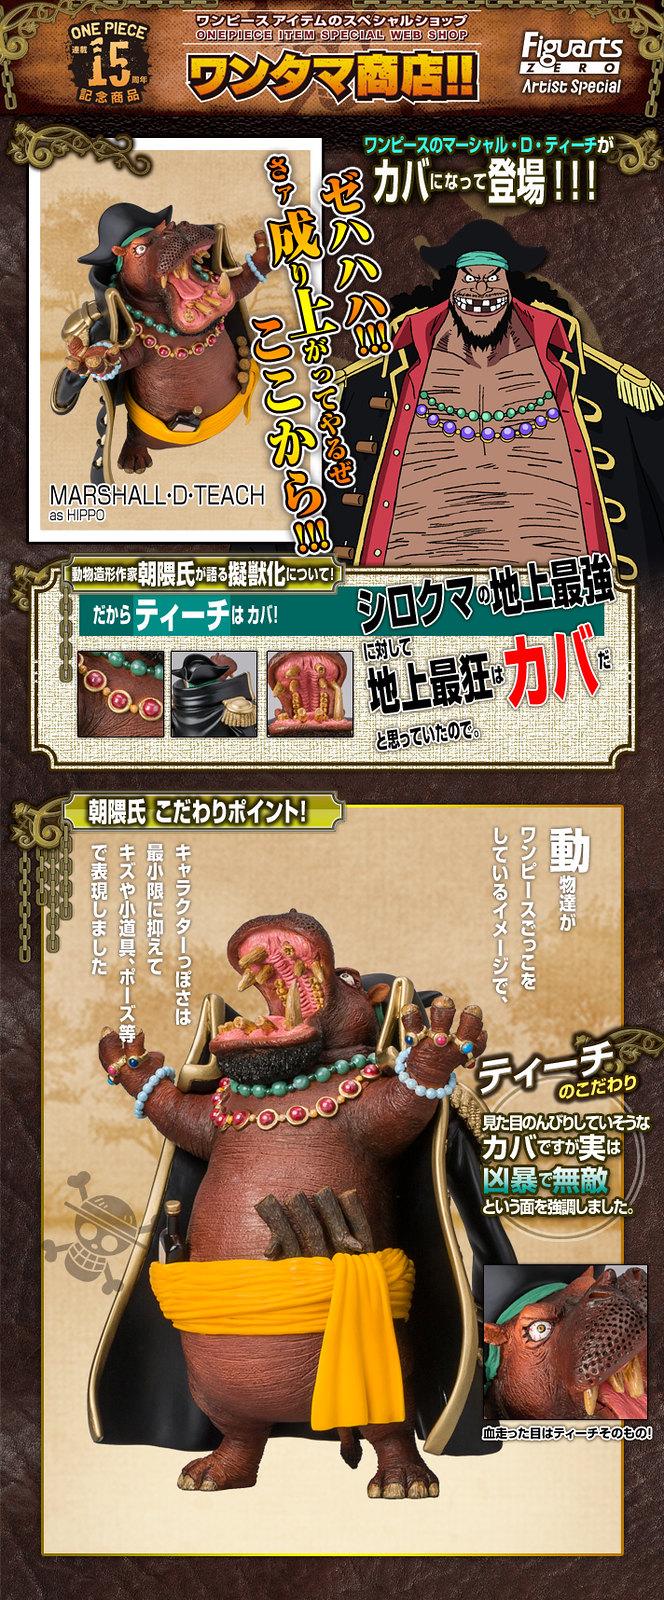 BANDAI - Figuarts ZERO Artist Special 第4彈公開!